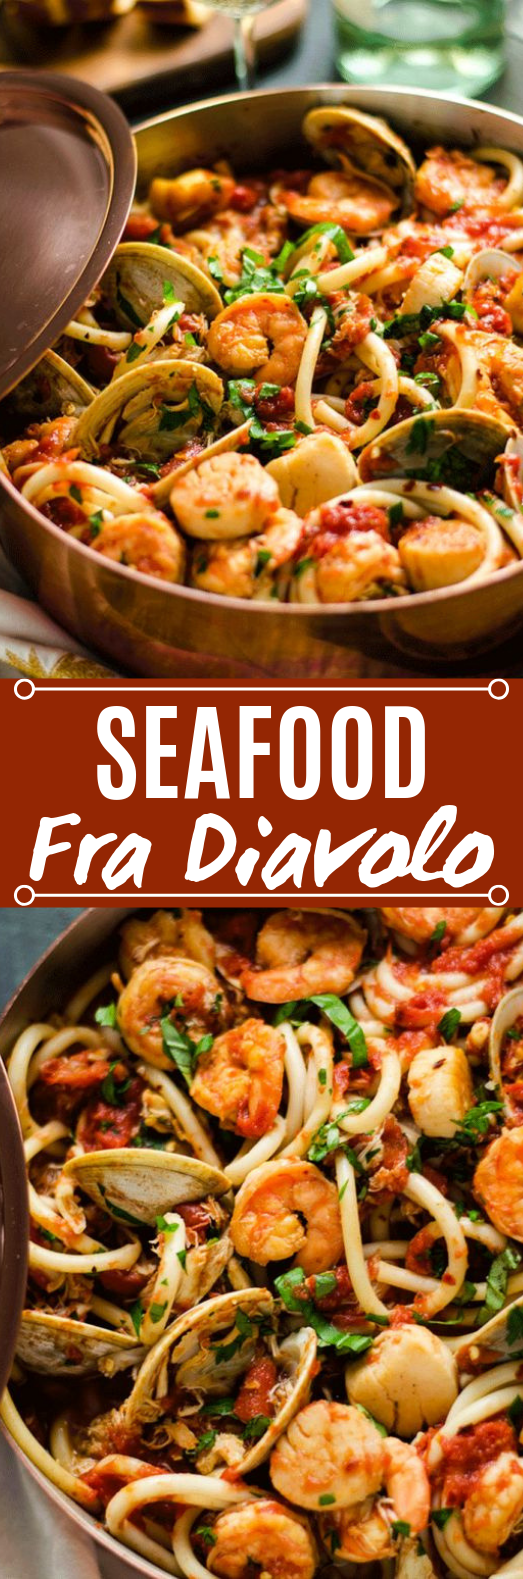 Seafood Fra Diavolo #dinner #seafood